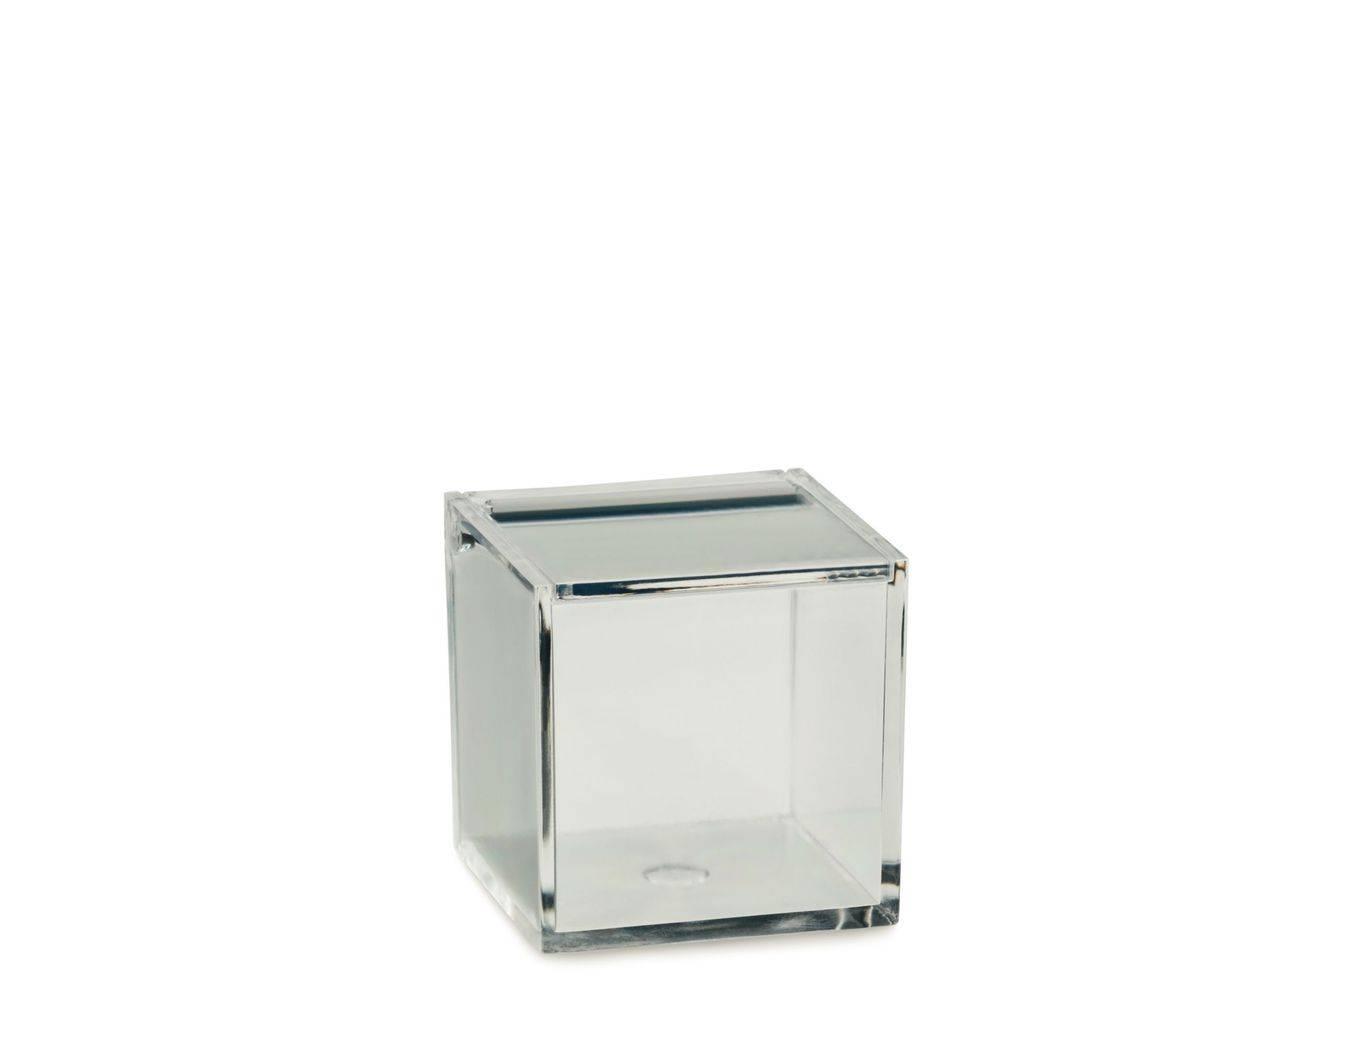 Kosmetická dóza SAFIRA plast, transparent, 6x6x6cm